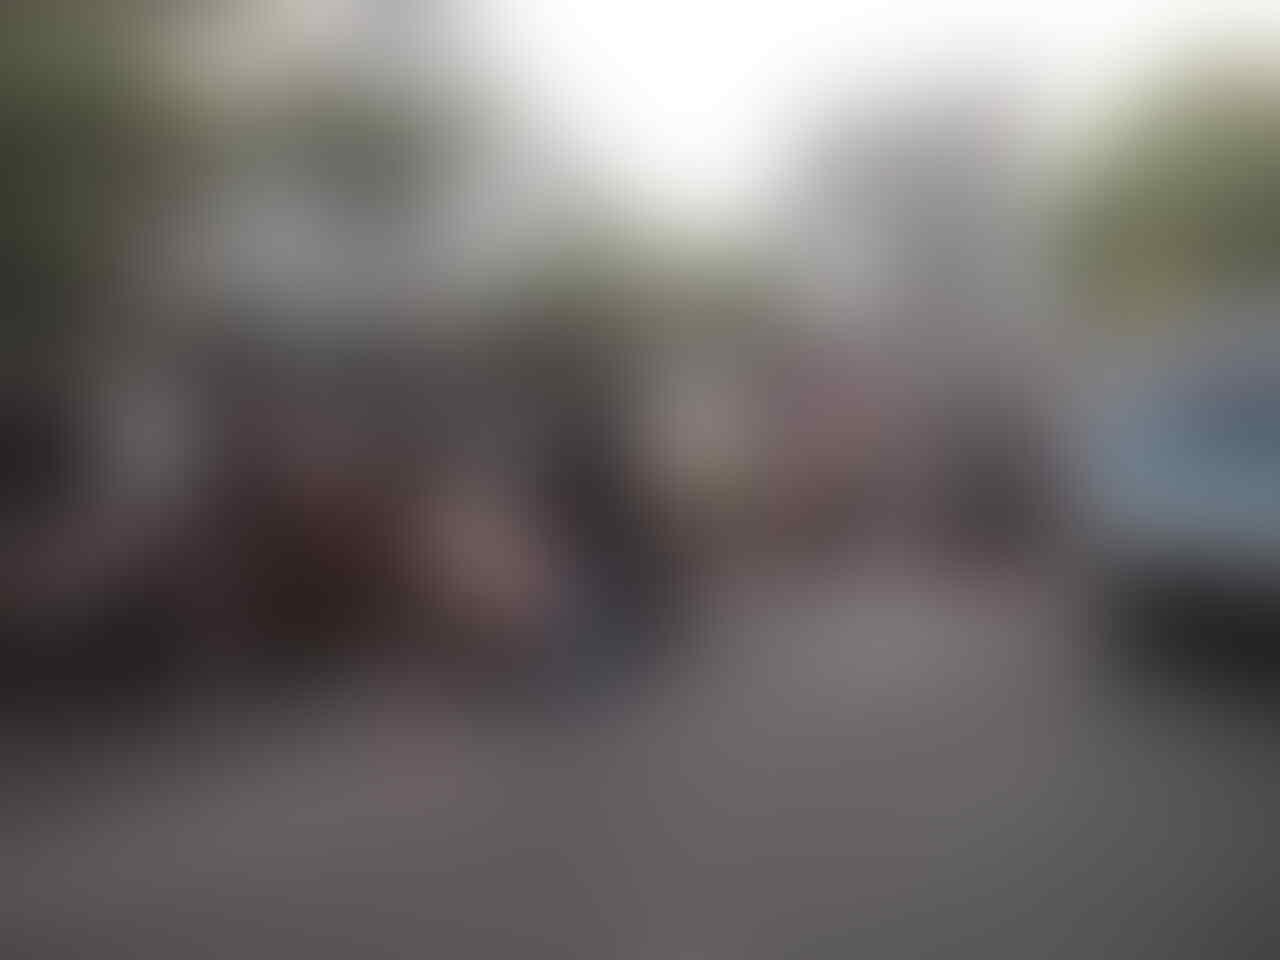 [FR] Kaskus Cendolin Indonesia Jilid 2 & Bagi Takjil | Regional Banyumas